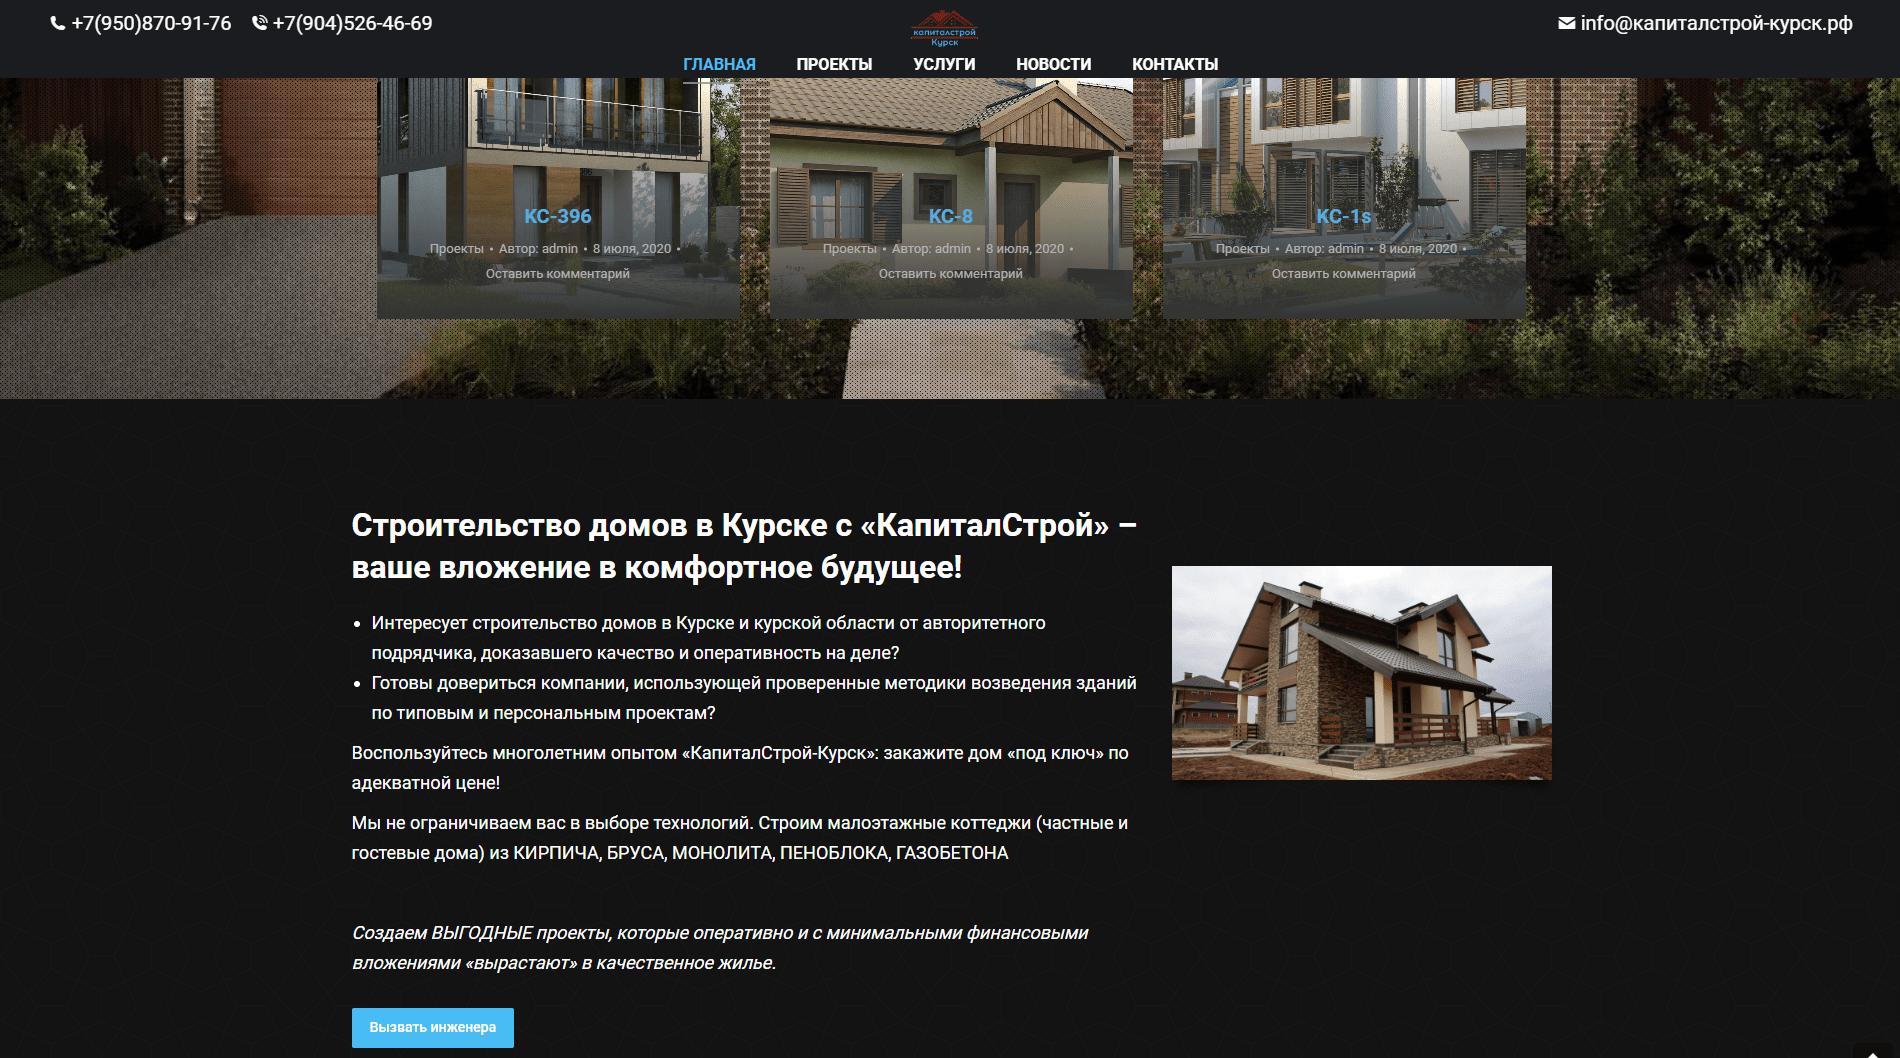 капиталстрой-курск.рф